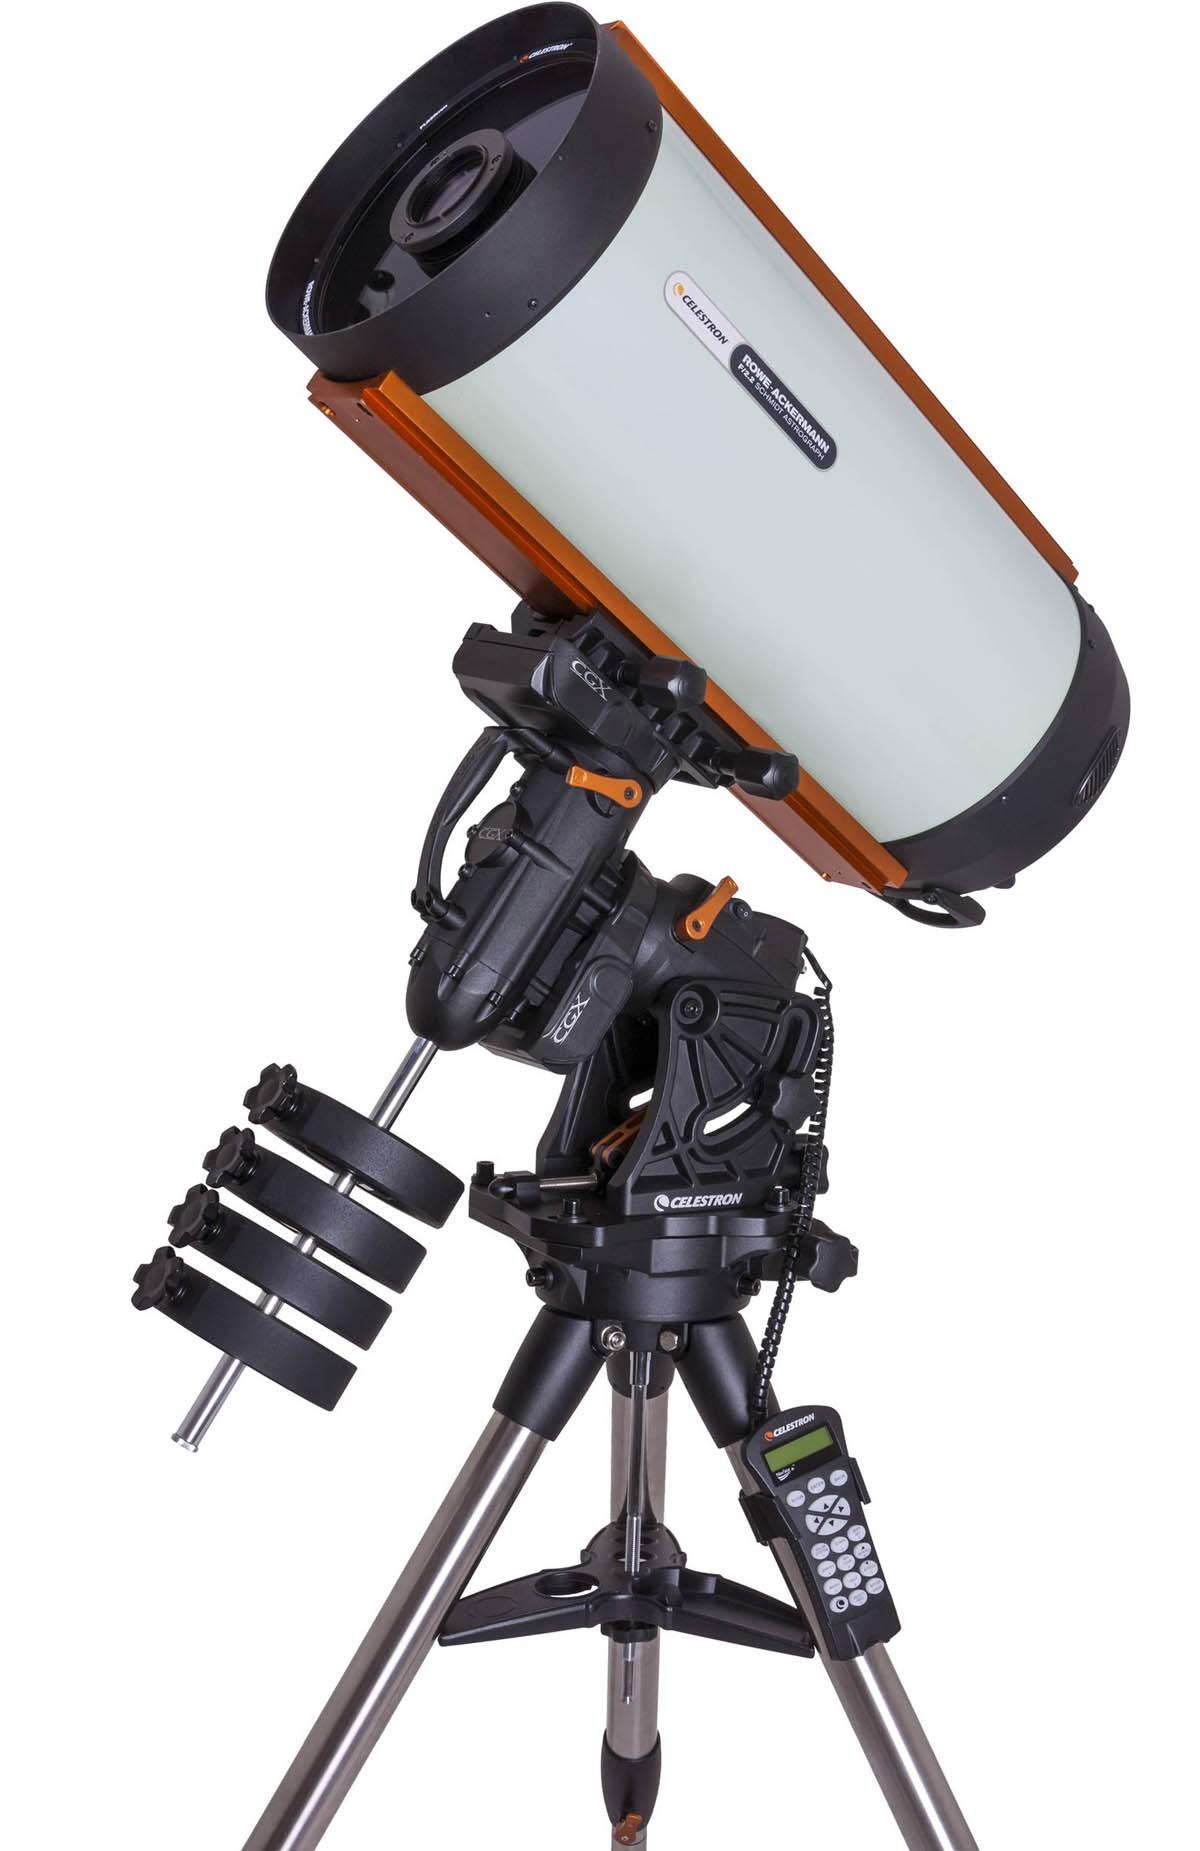 Celestron CGX EQ 1100 Rowe-Ackermann Schmidt Astrograph RASA GOTO Computerised Telescope